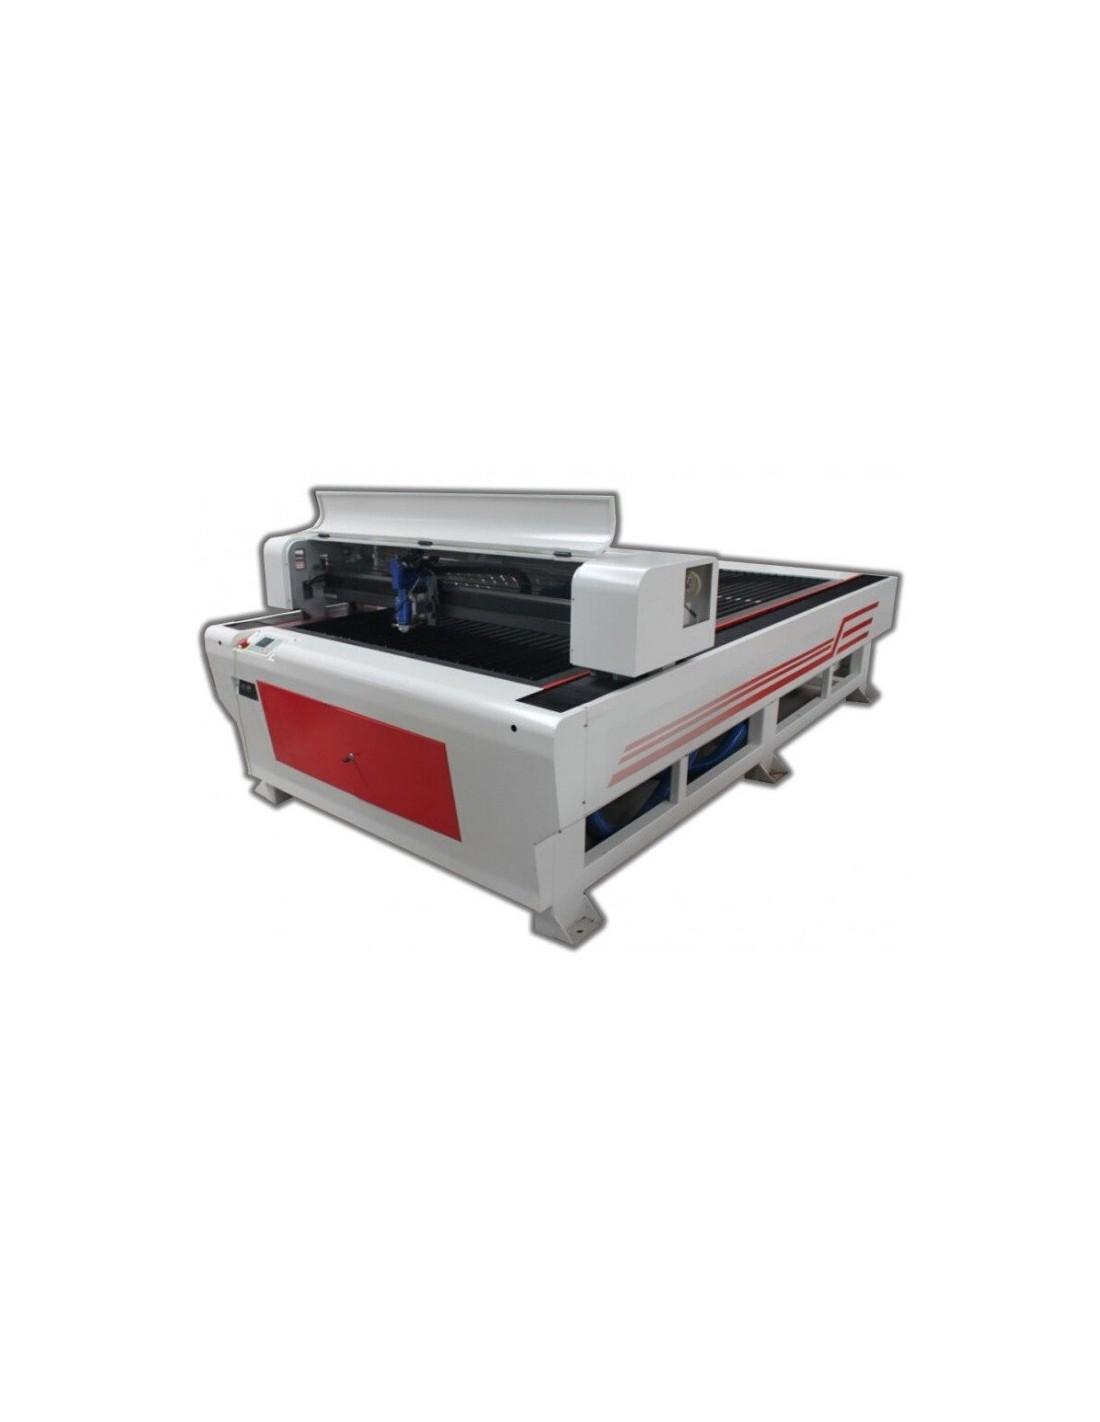 Masina de gravat si taiat cu laser CO2 Winter LaserMax Maxi 1626 - 150 W Stepper Metal & Non Metal - THC